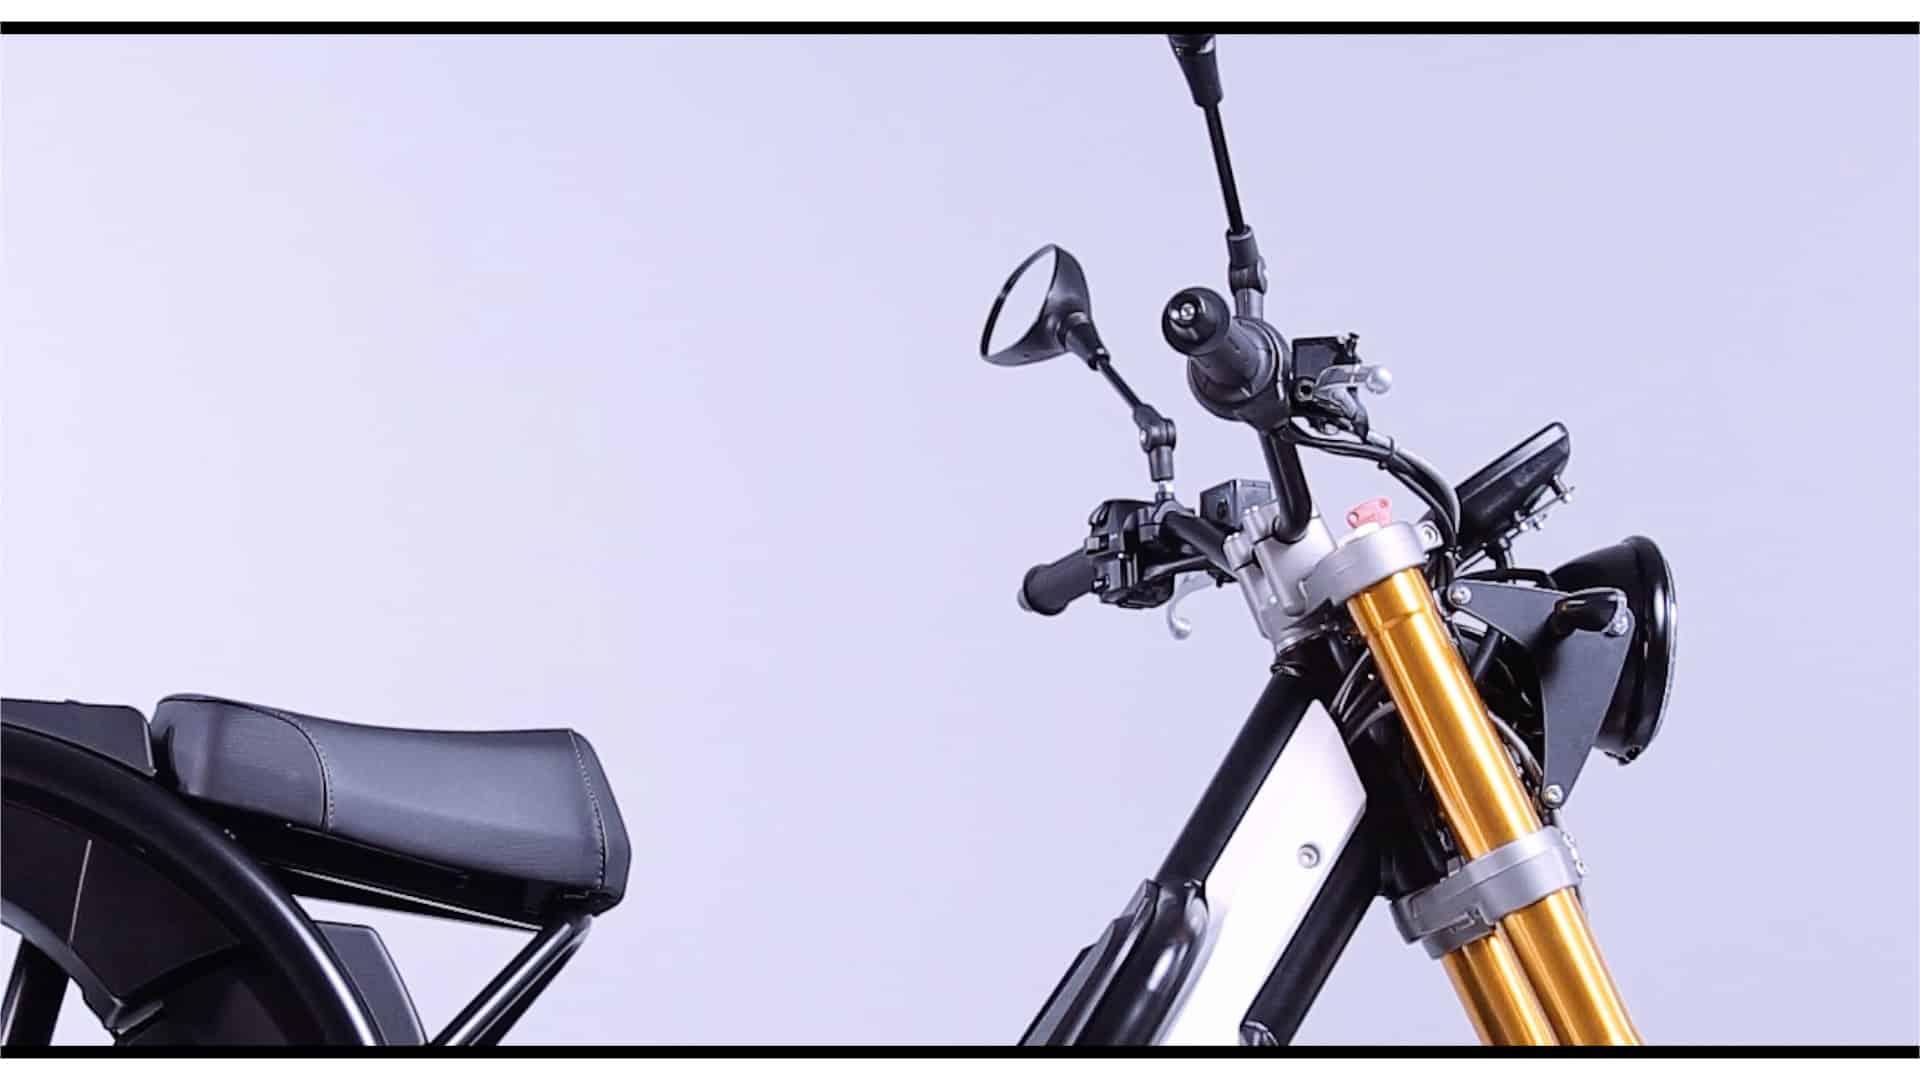 Cargopro NUUK moto eléctrica